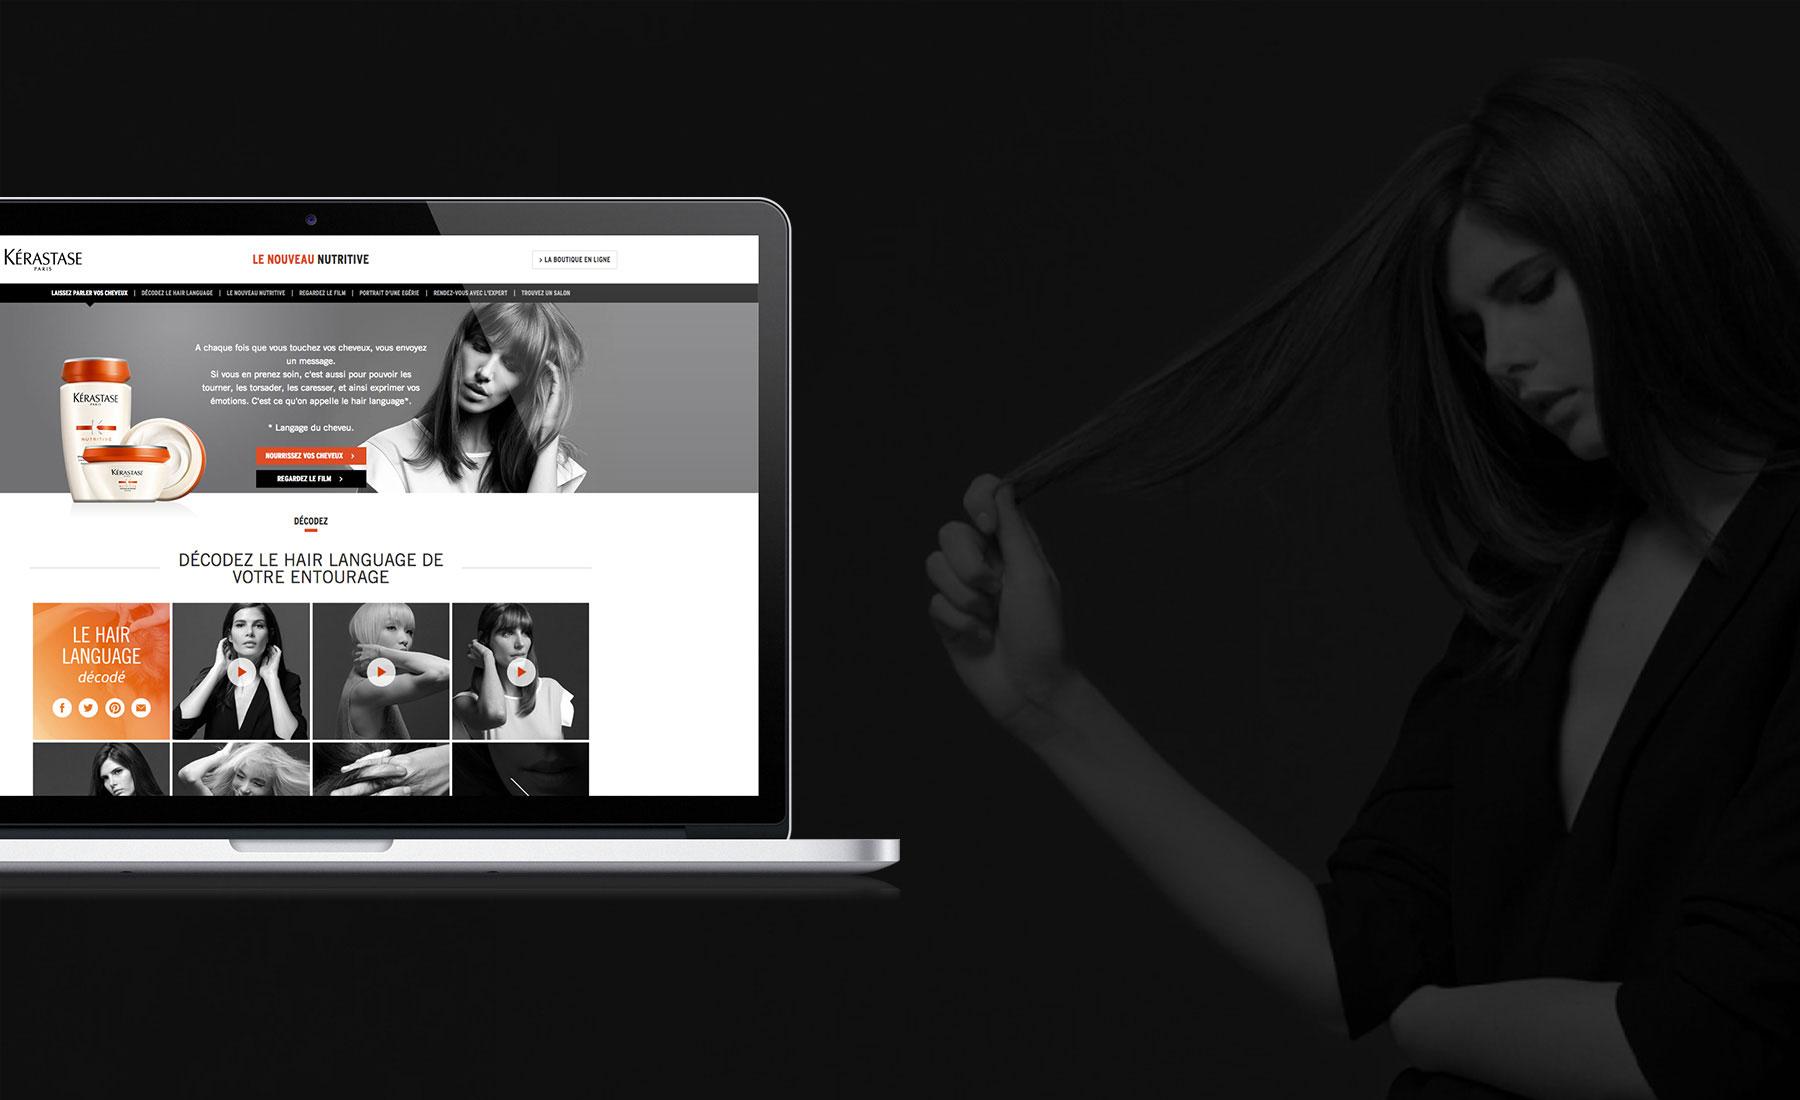 Kérastase - le langage des cheveux - Agence de communication Sharing